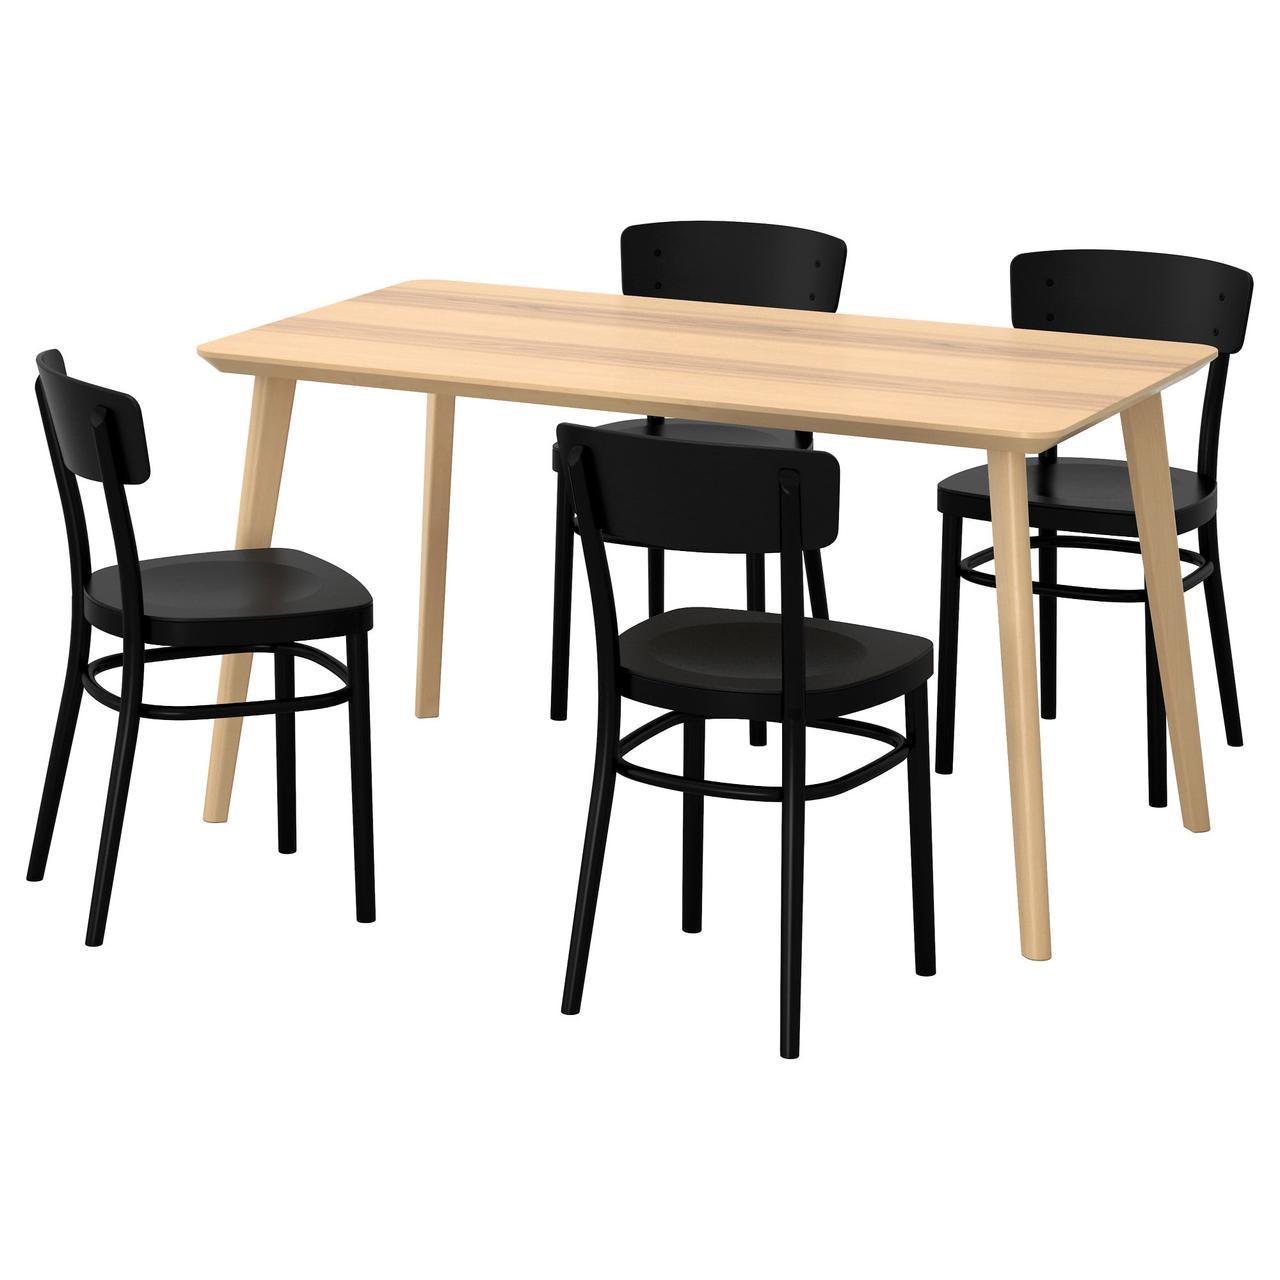 IKEA LISABO / IDOLF (991.614.85) Стол и 4 стула, ясень шпон, черный